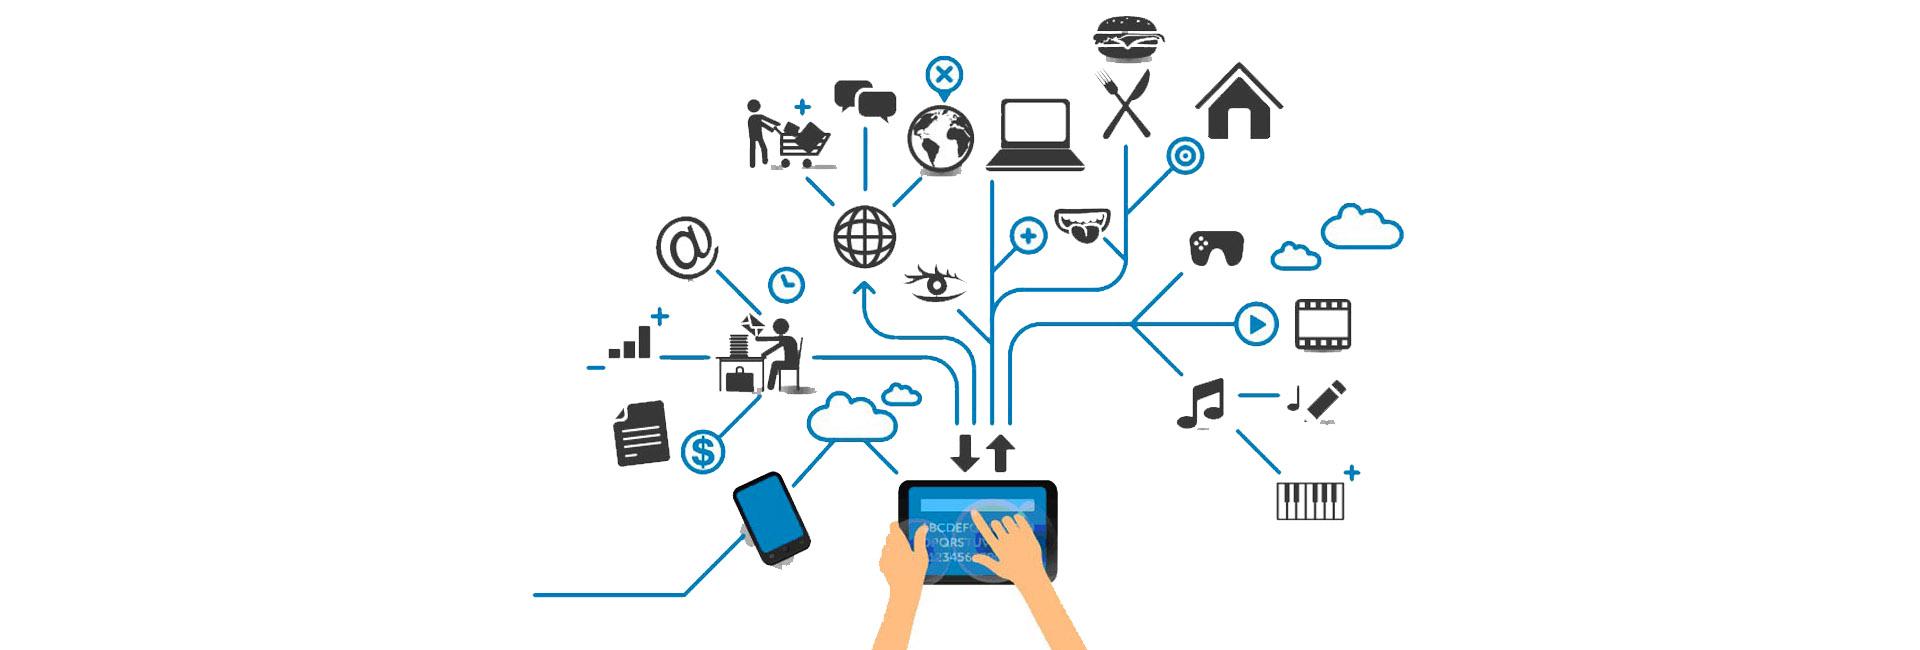 Internet of Things za početnike